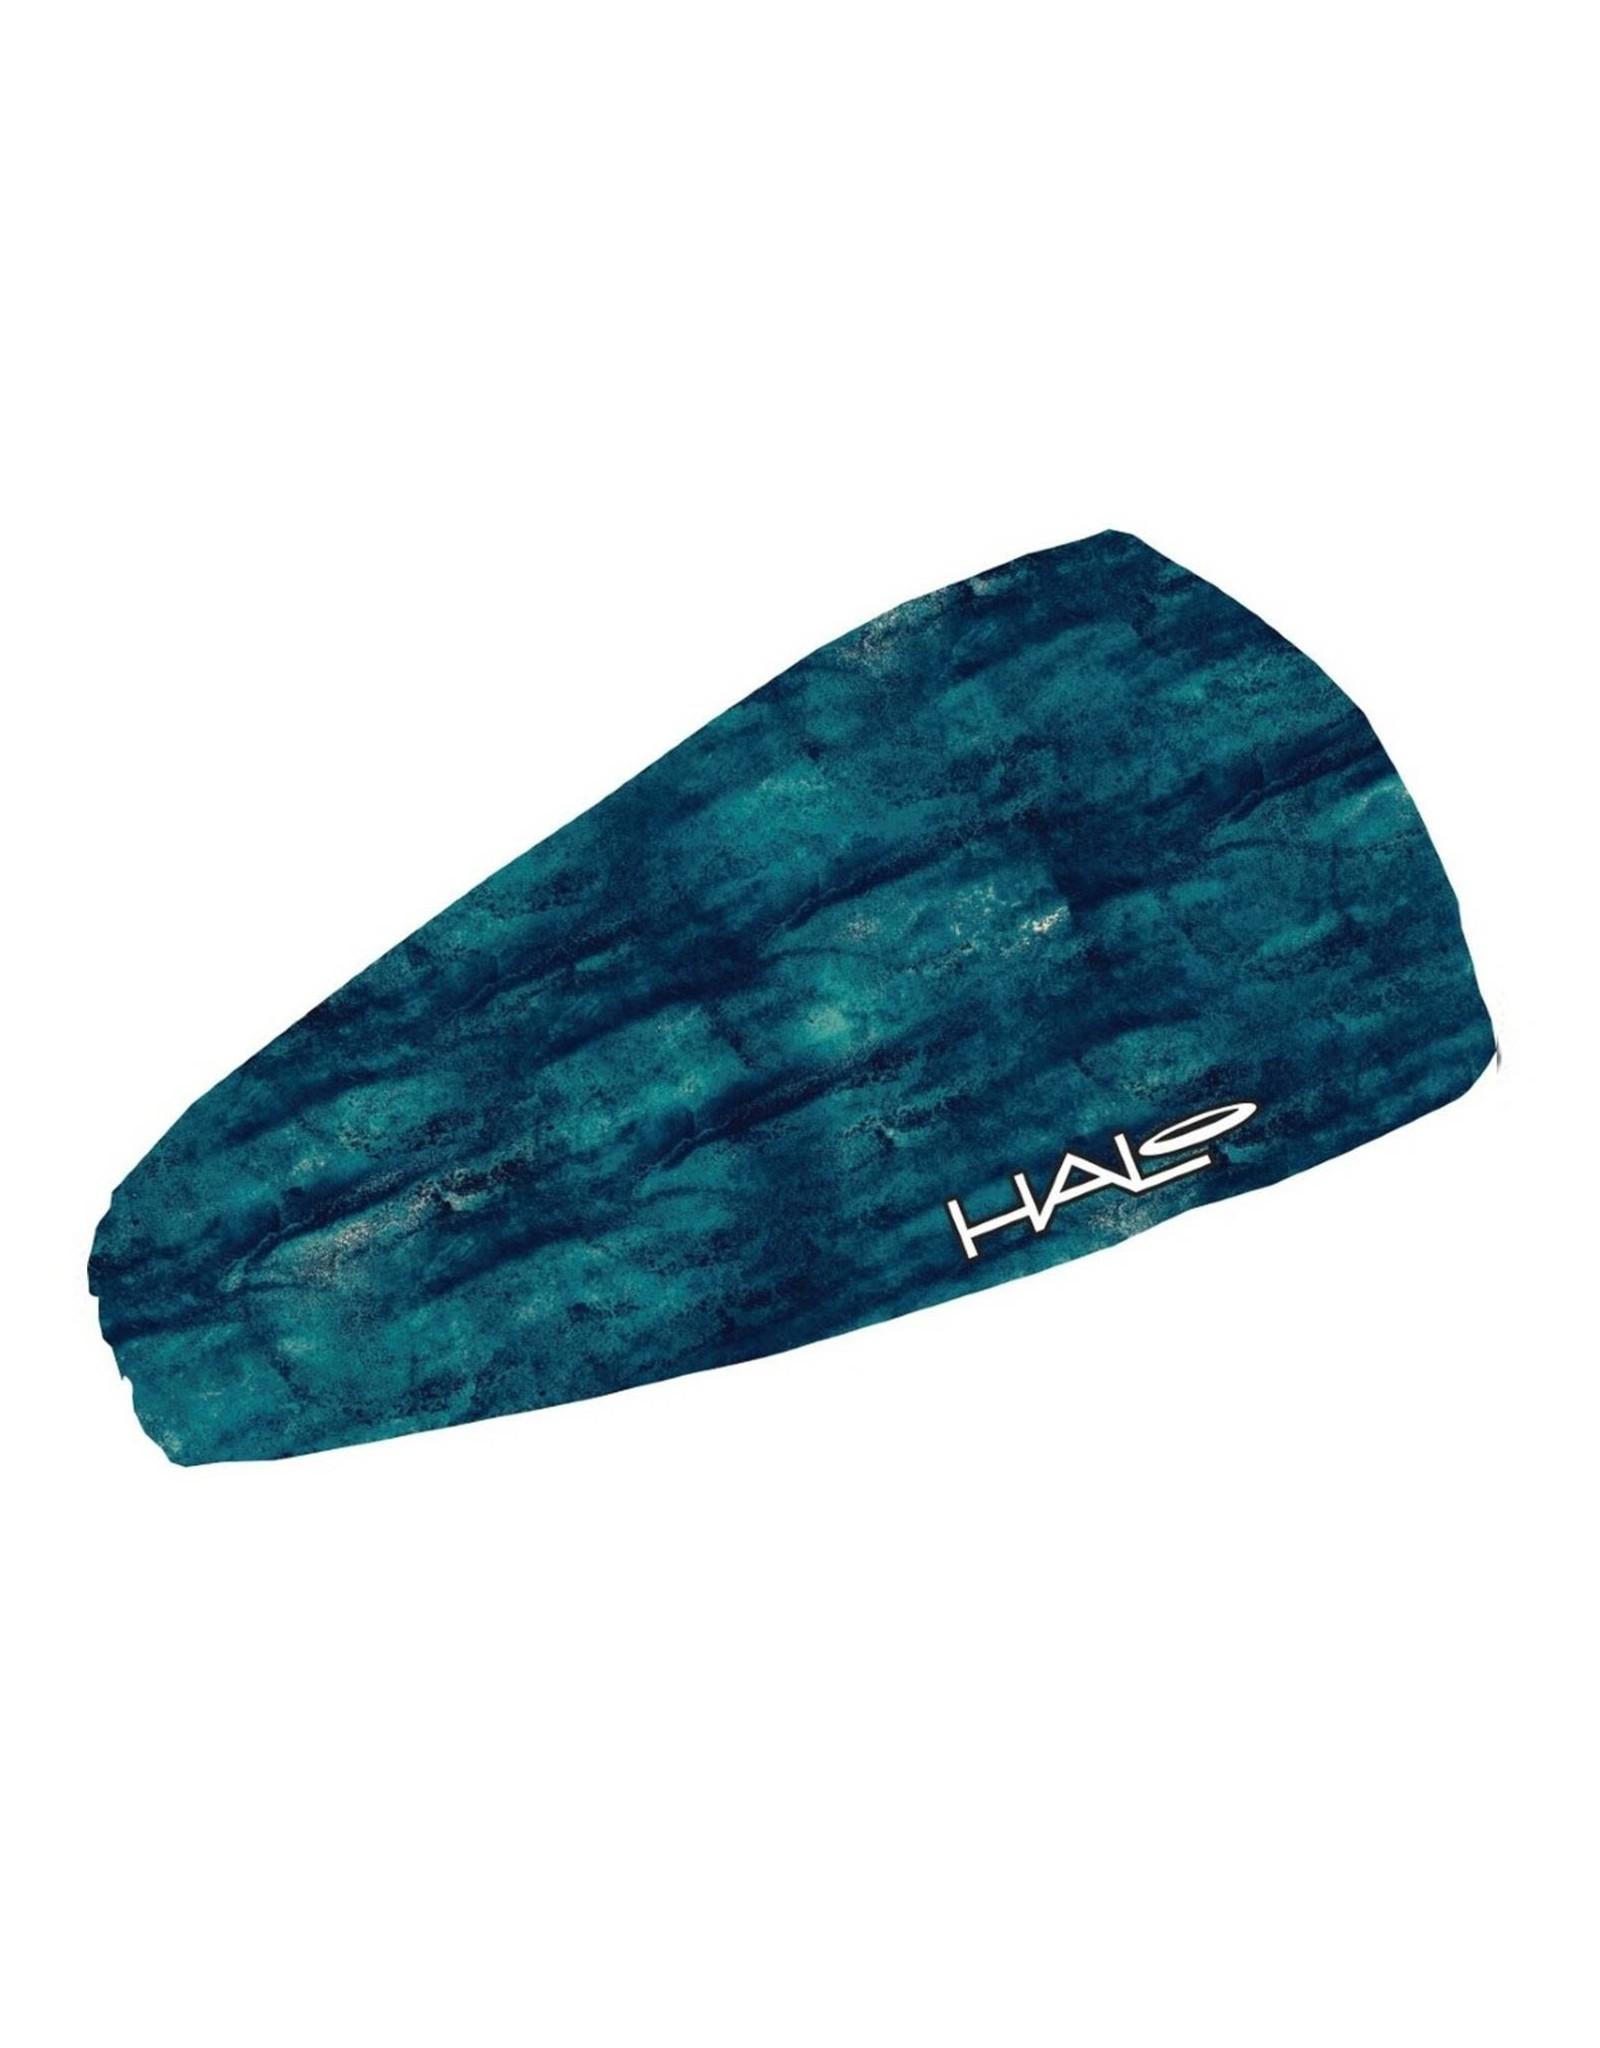 Halo Bandit Headband Ocean